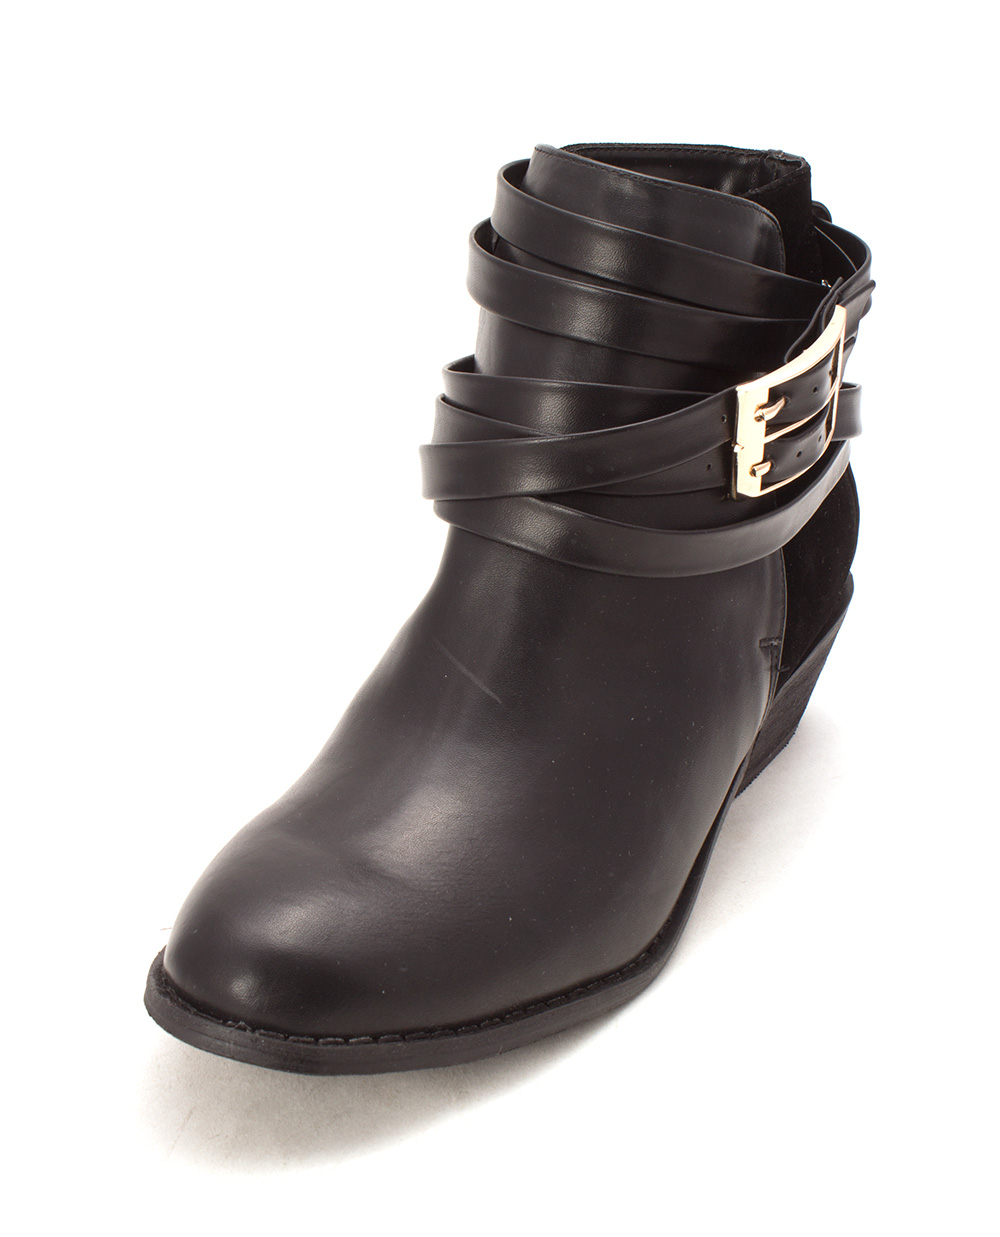 ShoeDazzle Womens Arlenis Almond Toe Ankle Fashion Boots, Black, Size 9.0